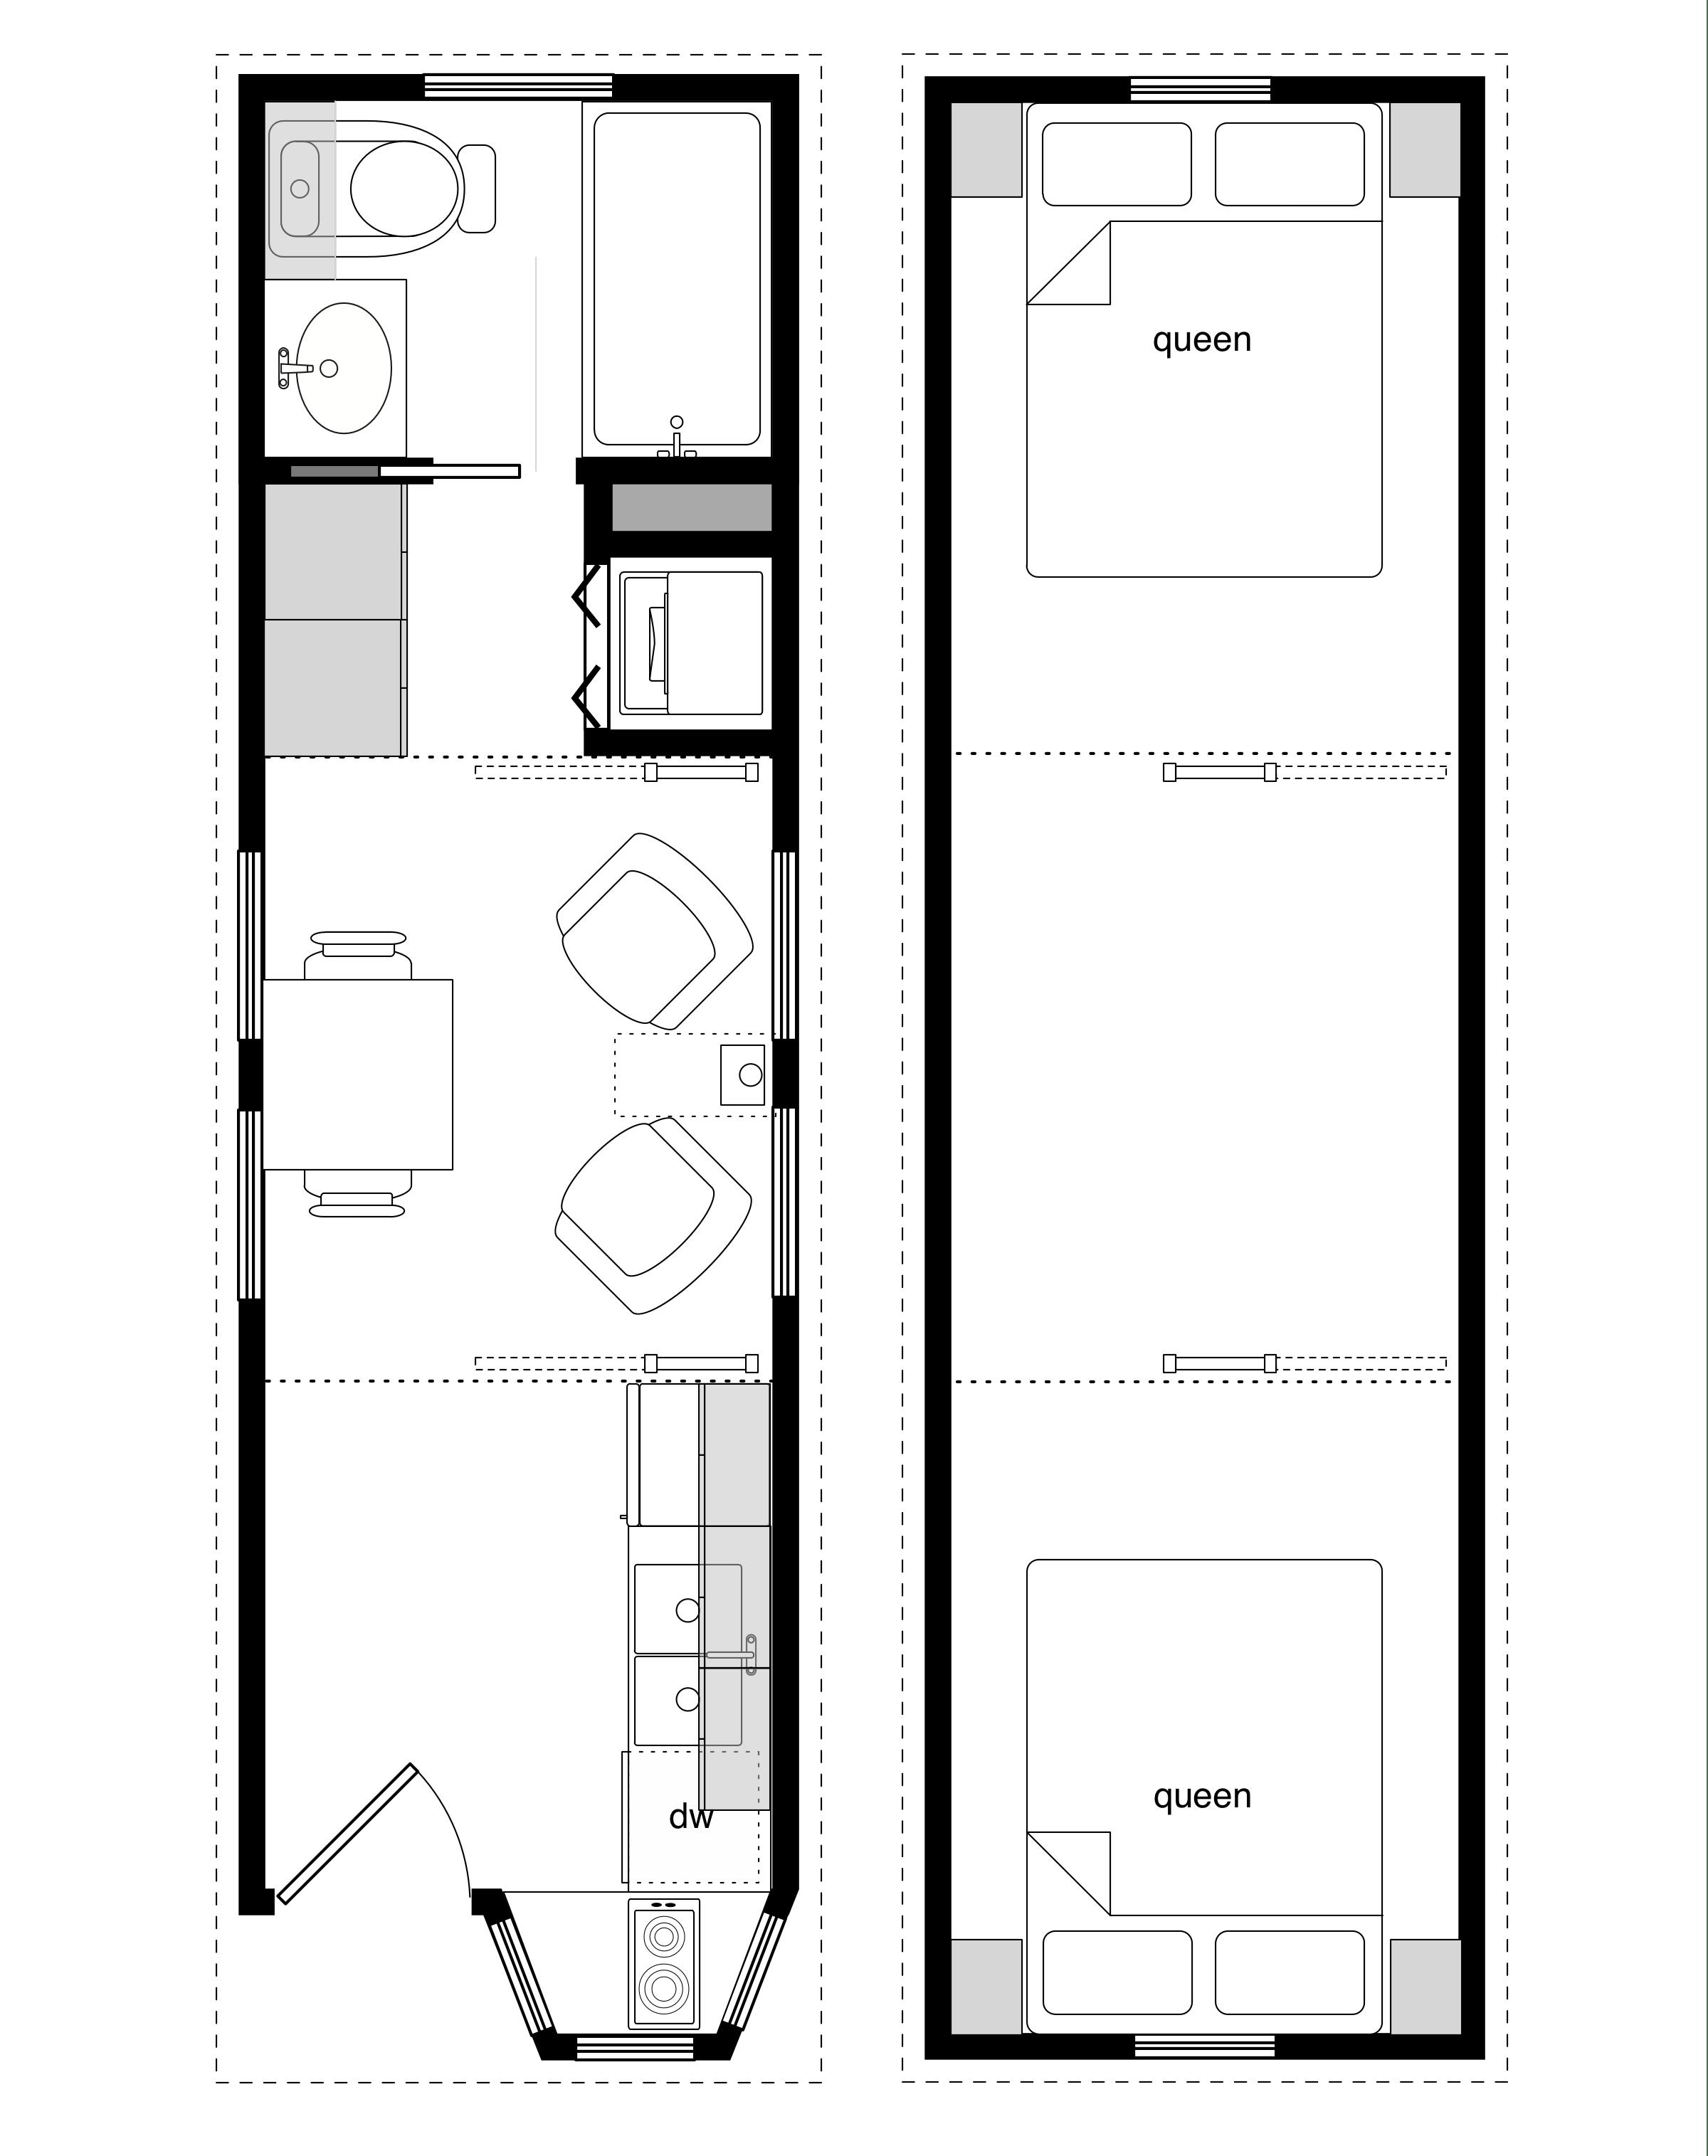 Sample floor plans for the 8 28 coastal cottage for House blueprint sample